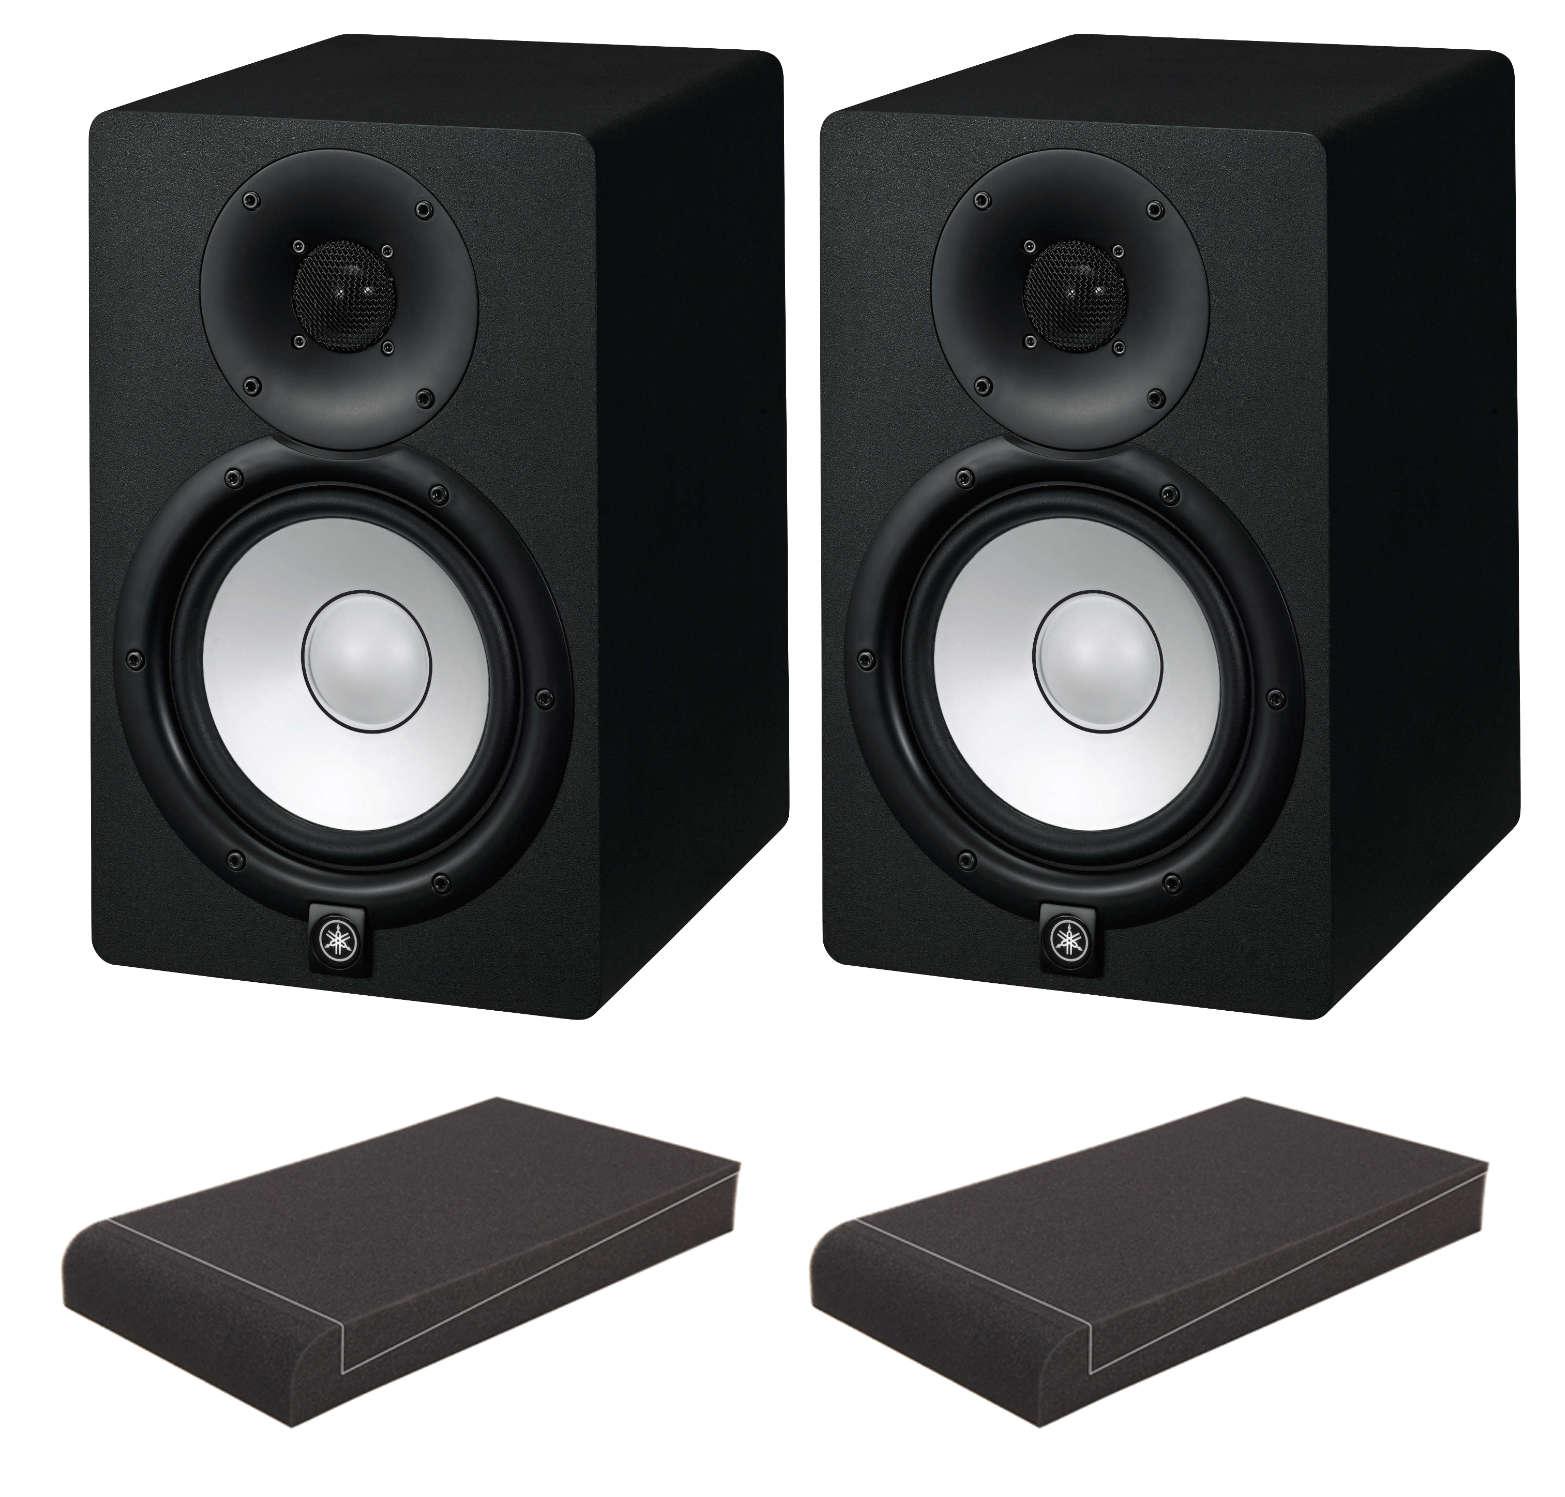 Studiomonitore - Yamaha HS7 MP ISO Set - Onlineshop Musikhaus Kirstein